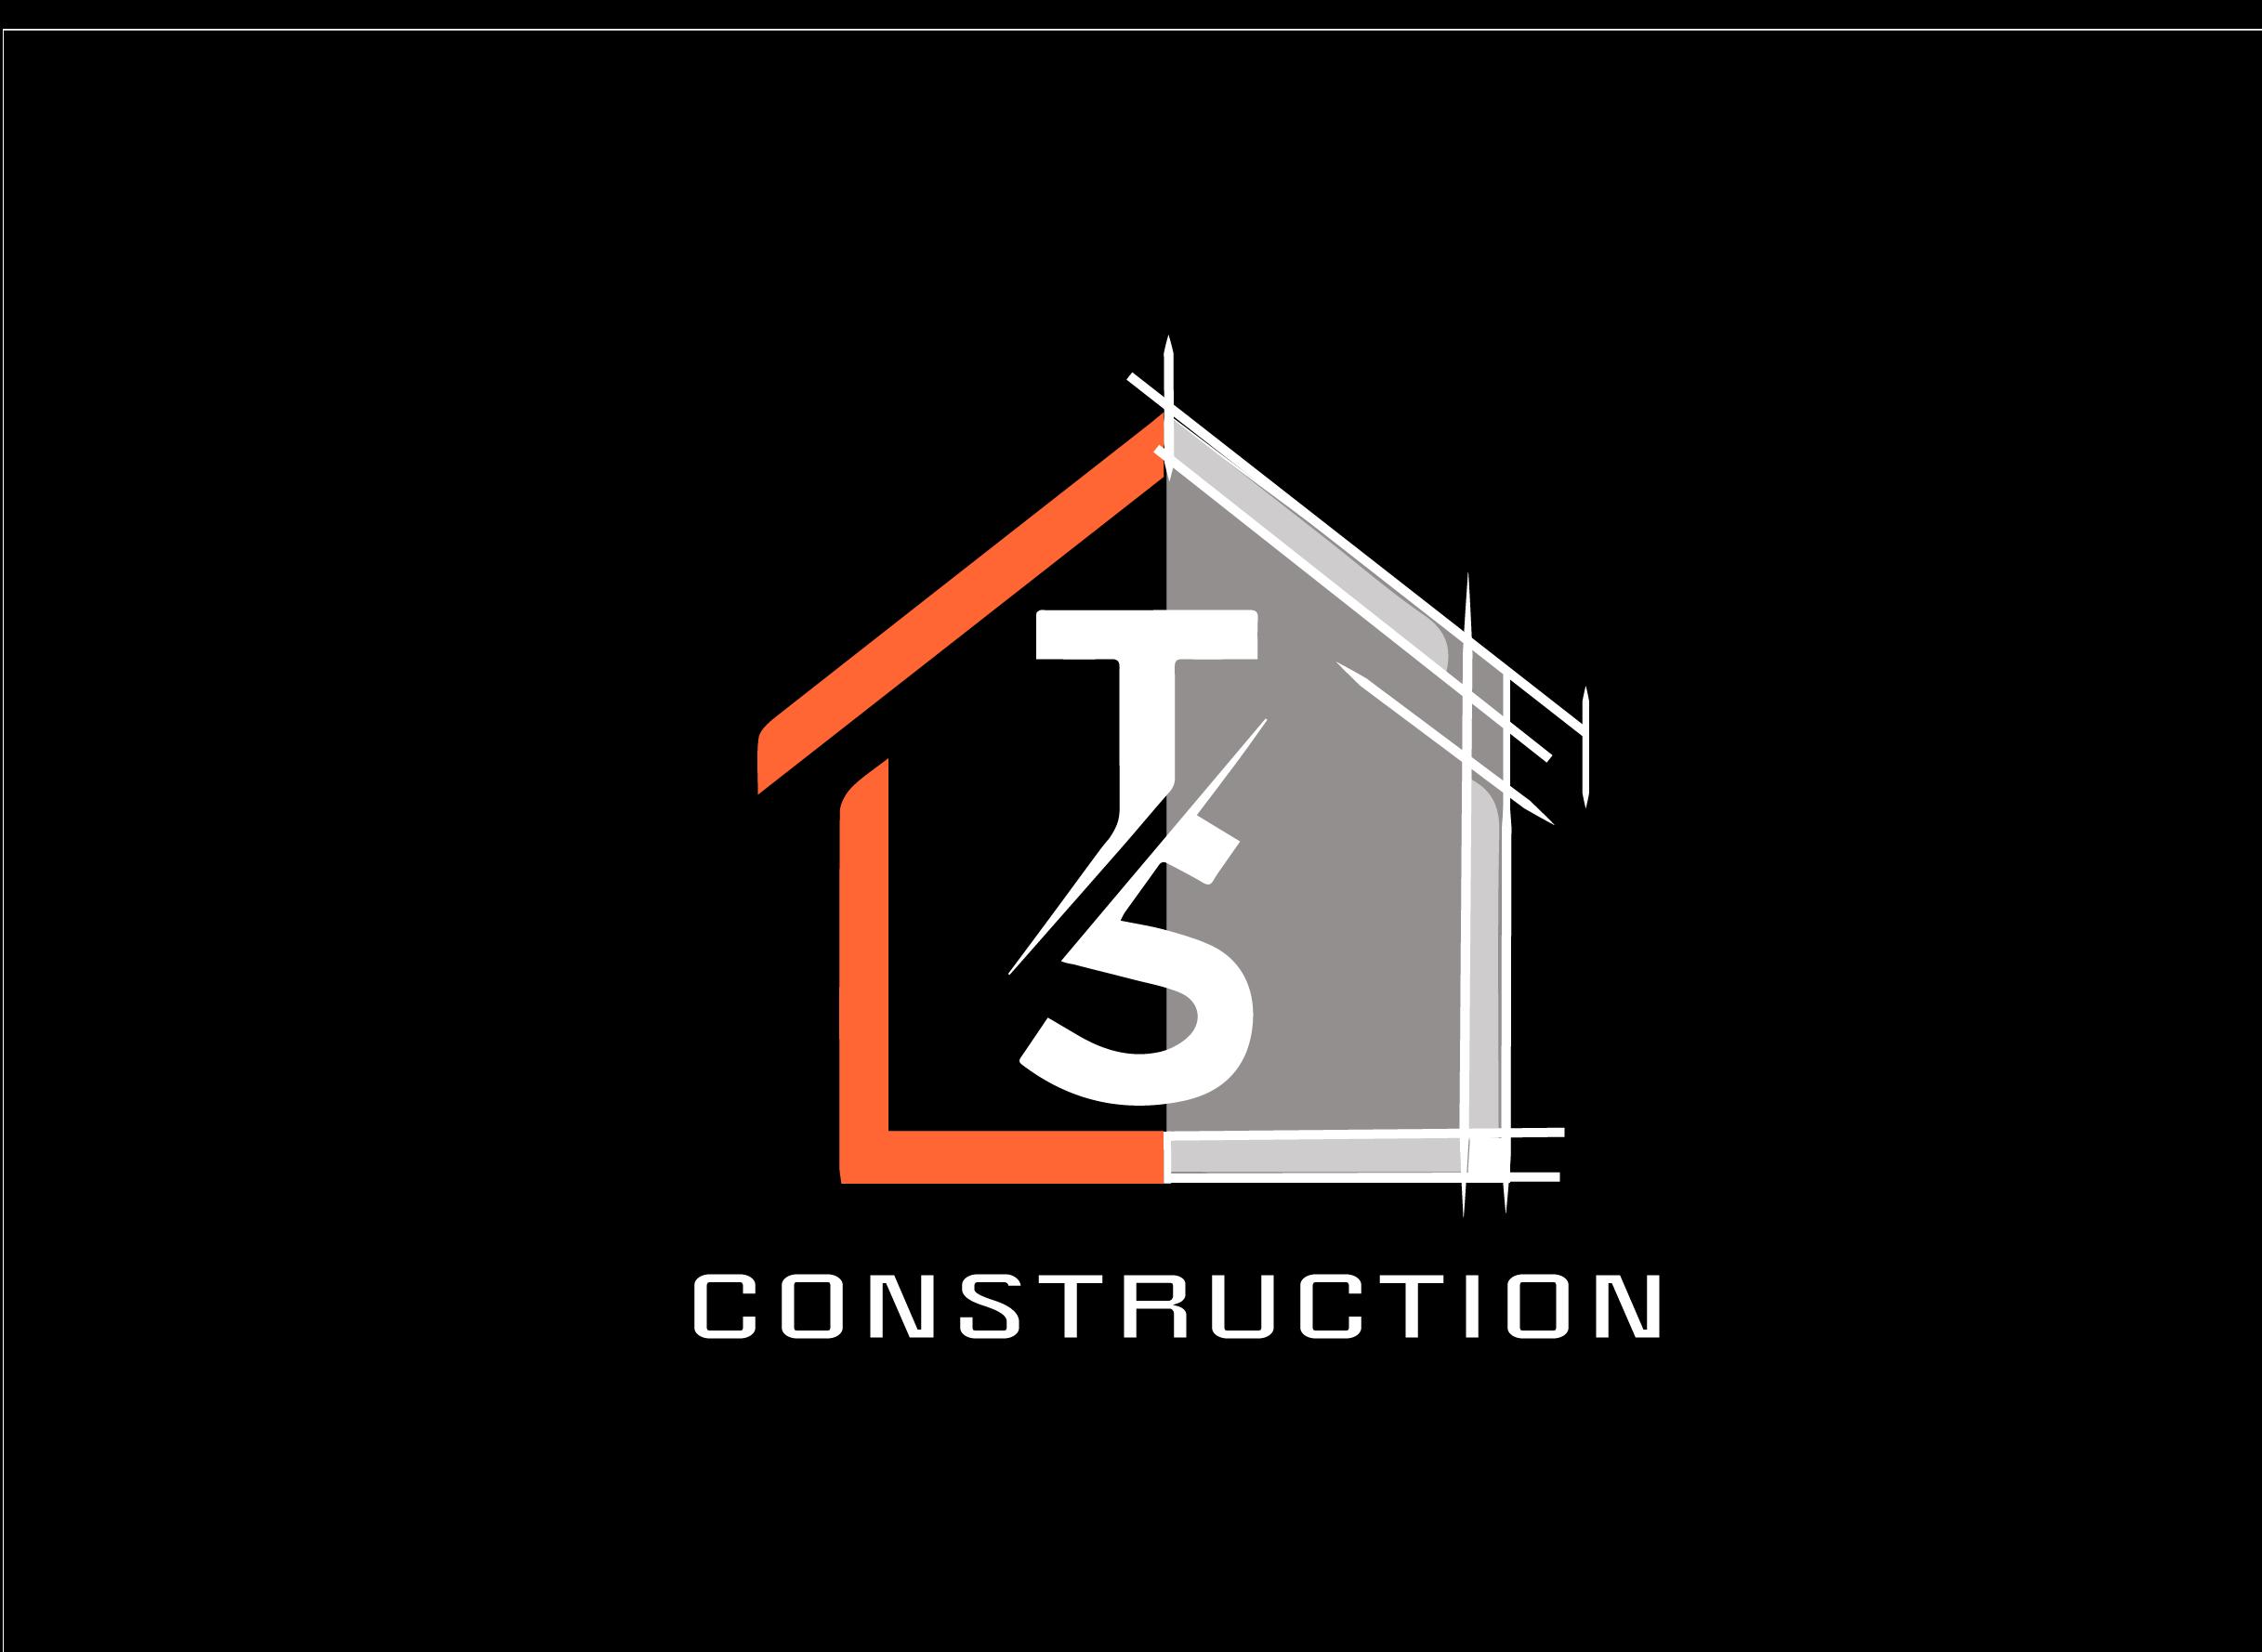 logo TS construction fond noir